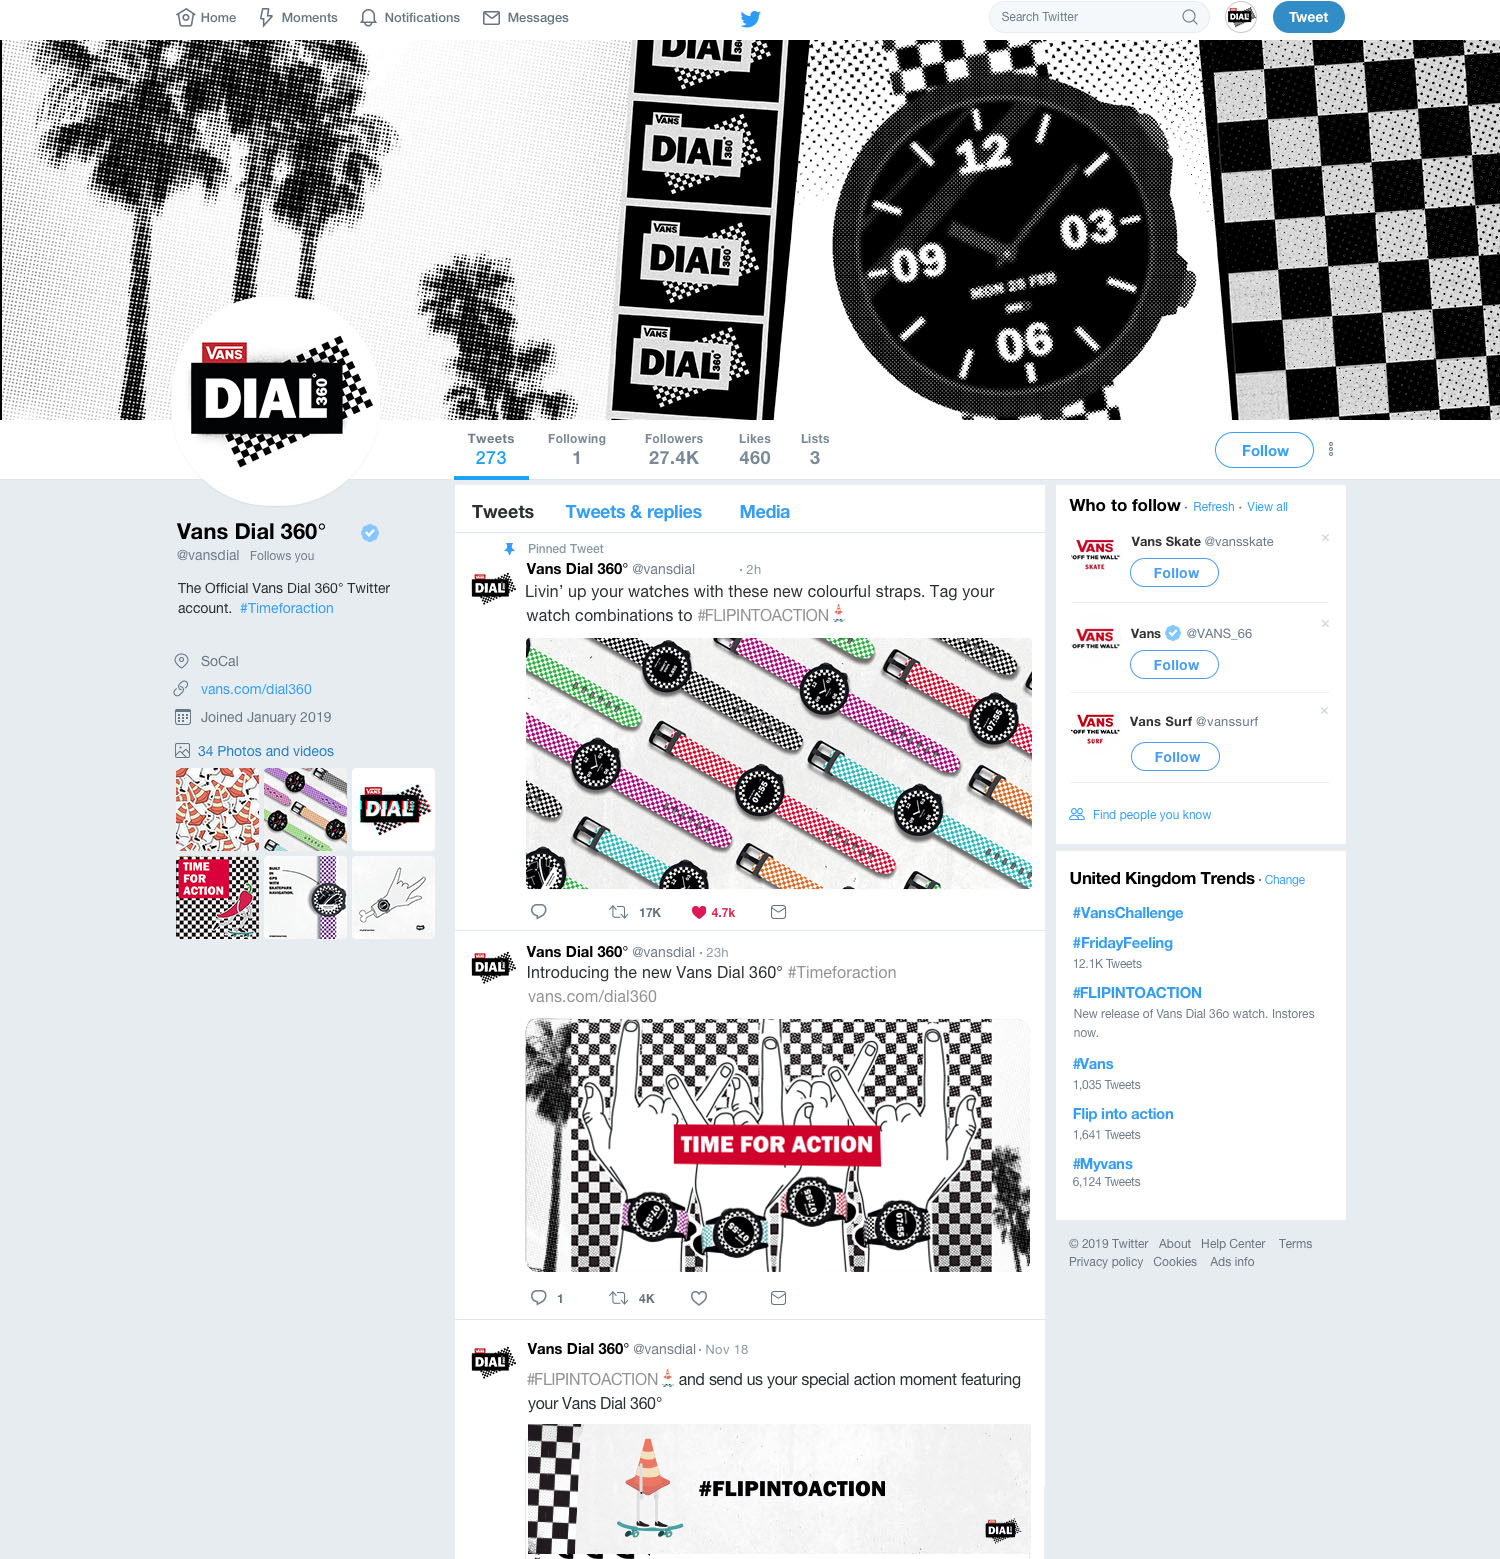 Snapshot of VANS DIAL 36O° desktop Twitter feed